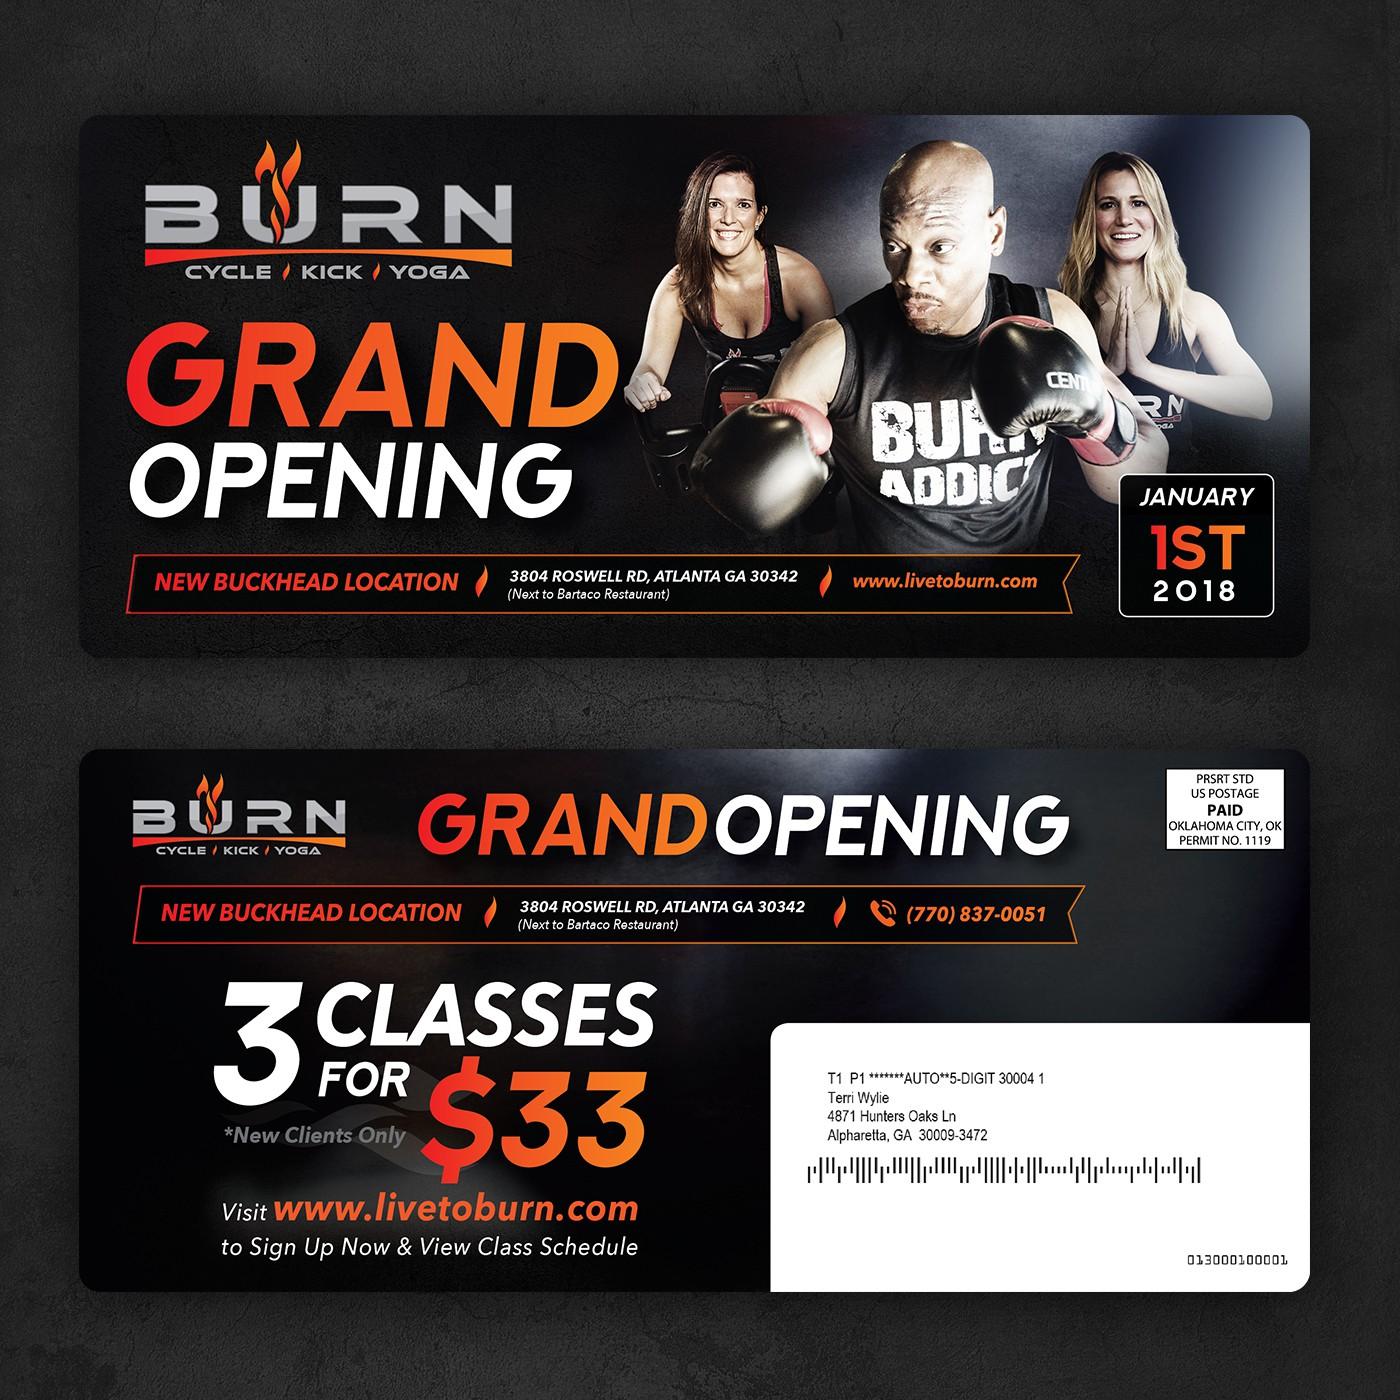 Grand Opening Postcard for BURN Fitness Studio